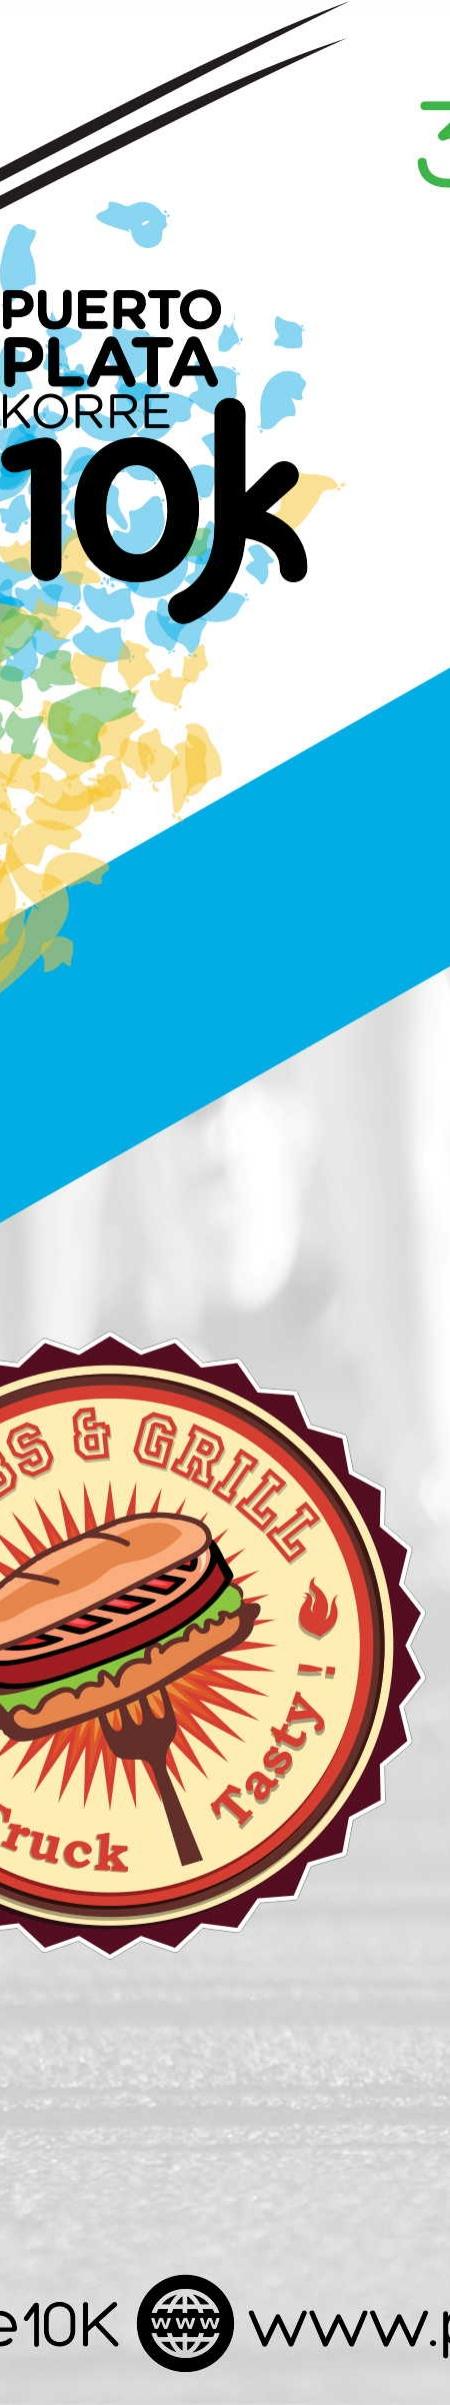 6- PPK – Food Truck Tasty & Hielo Internacional